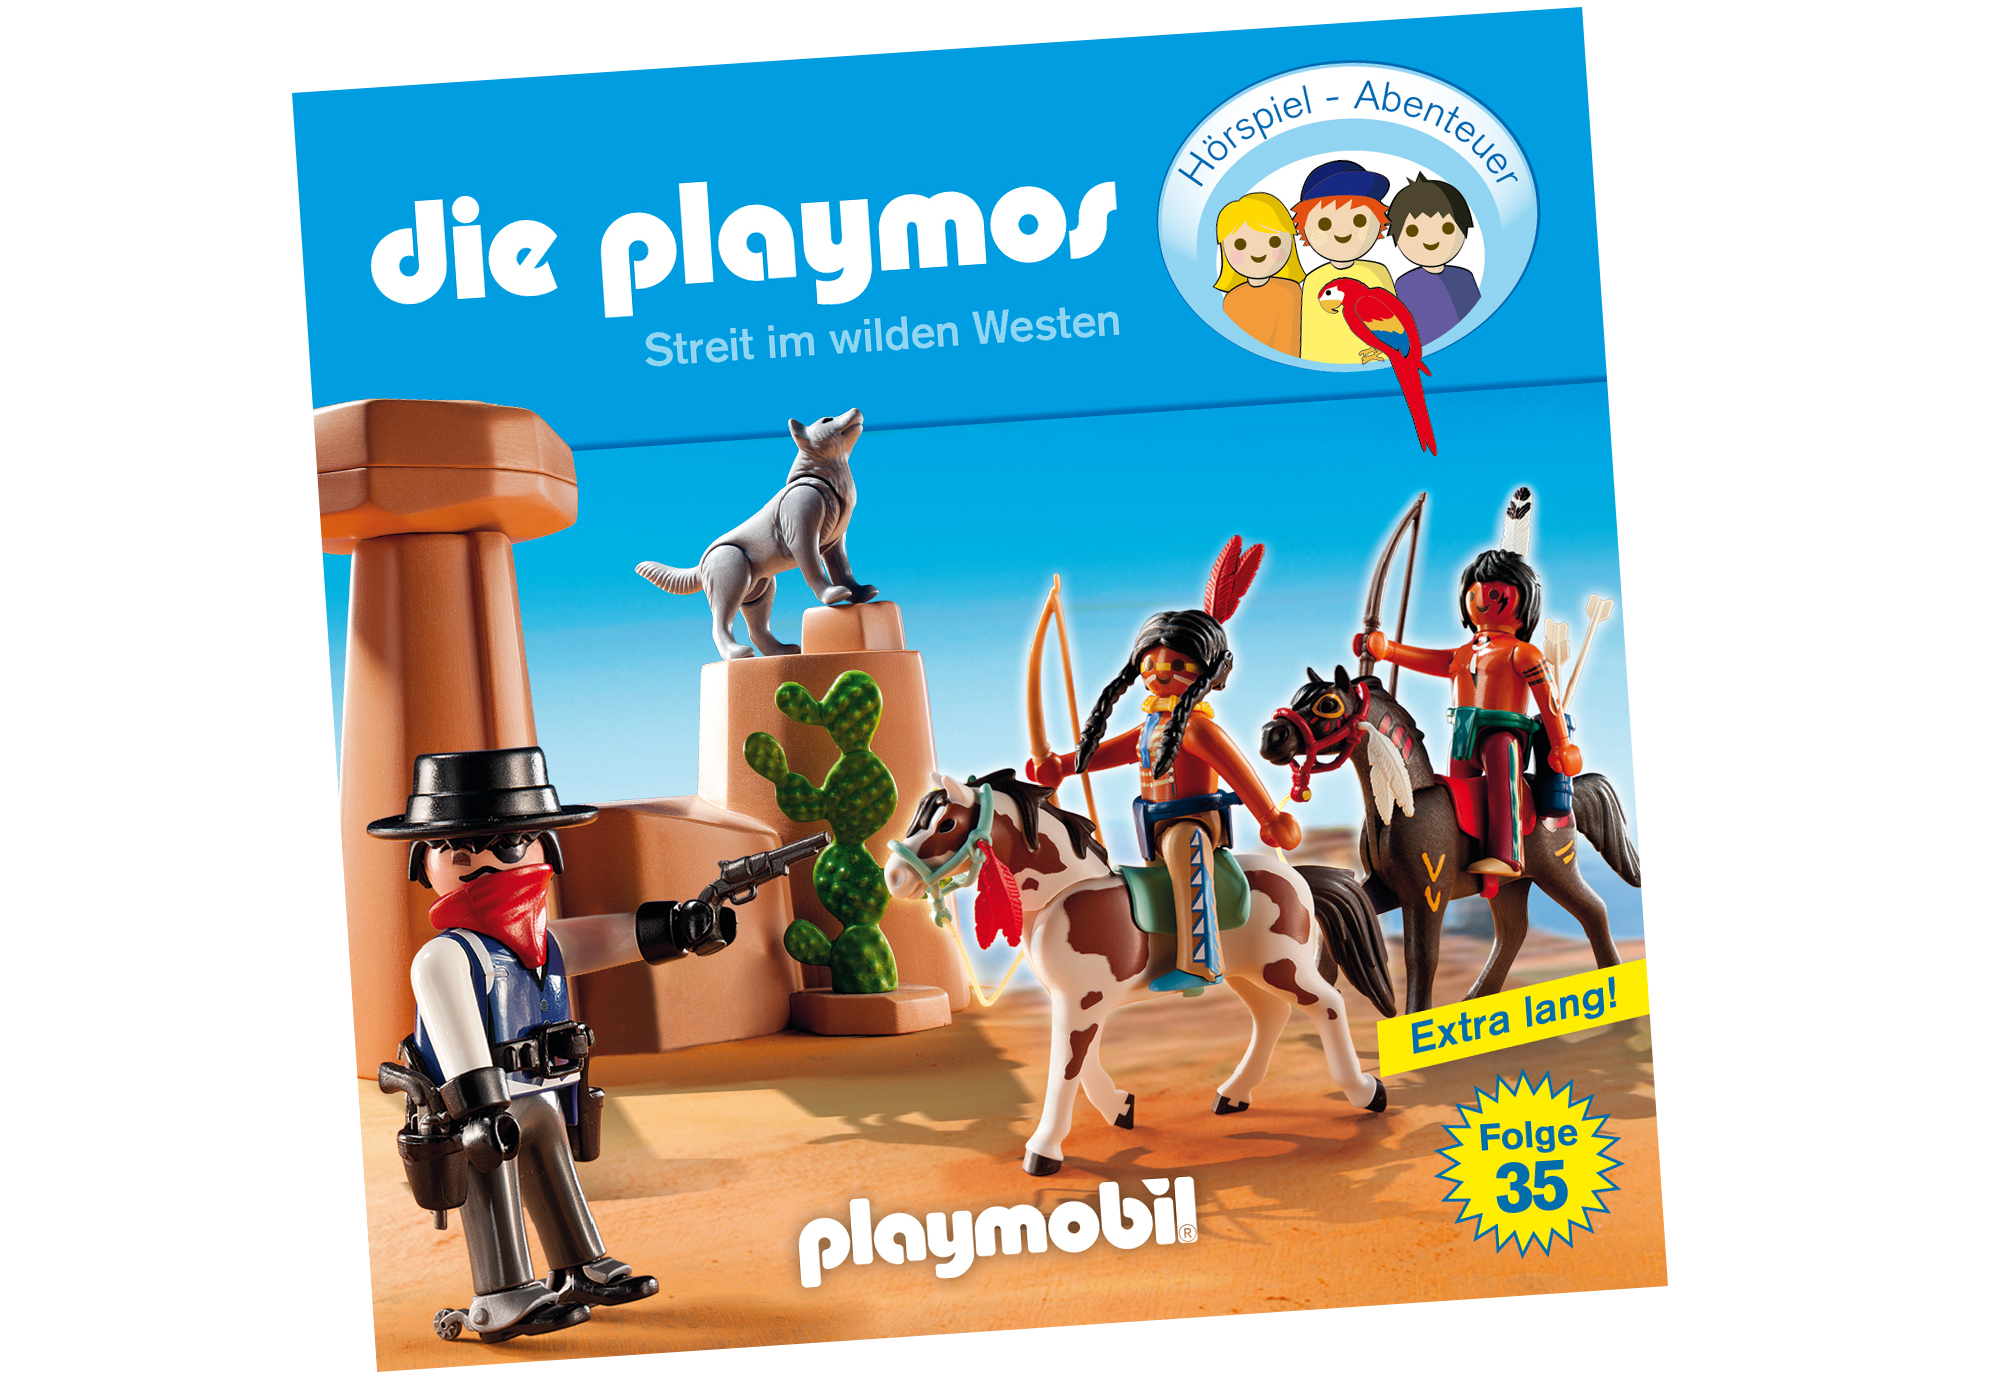 http://media.playmobil.com/i/playmobil/80446_product_detail